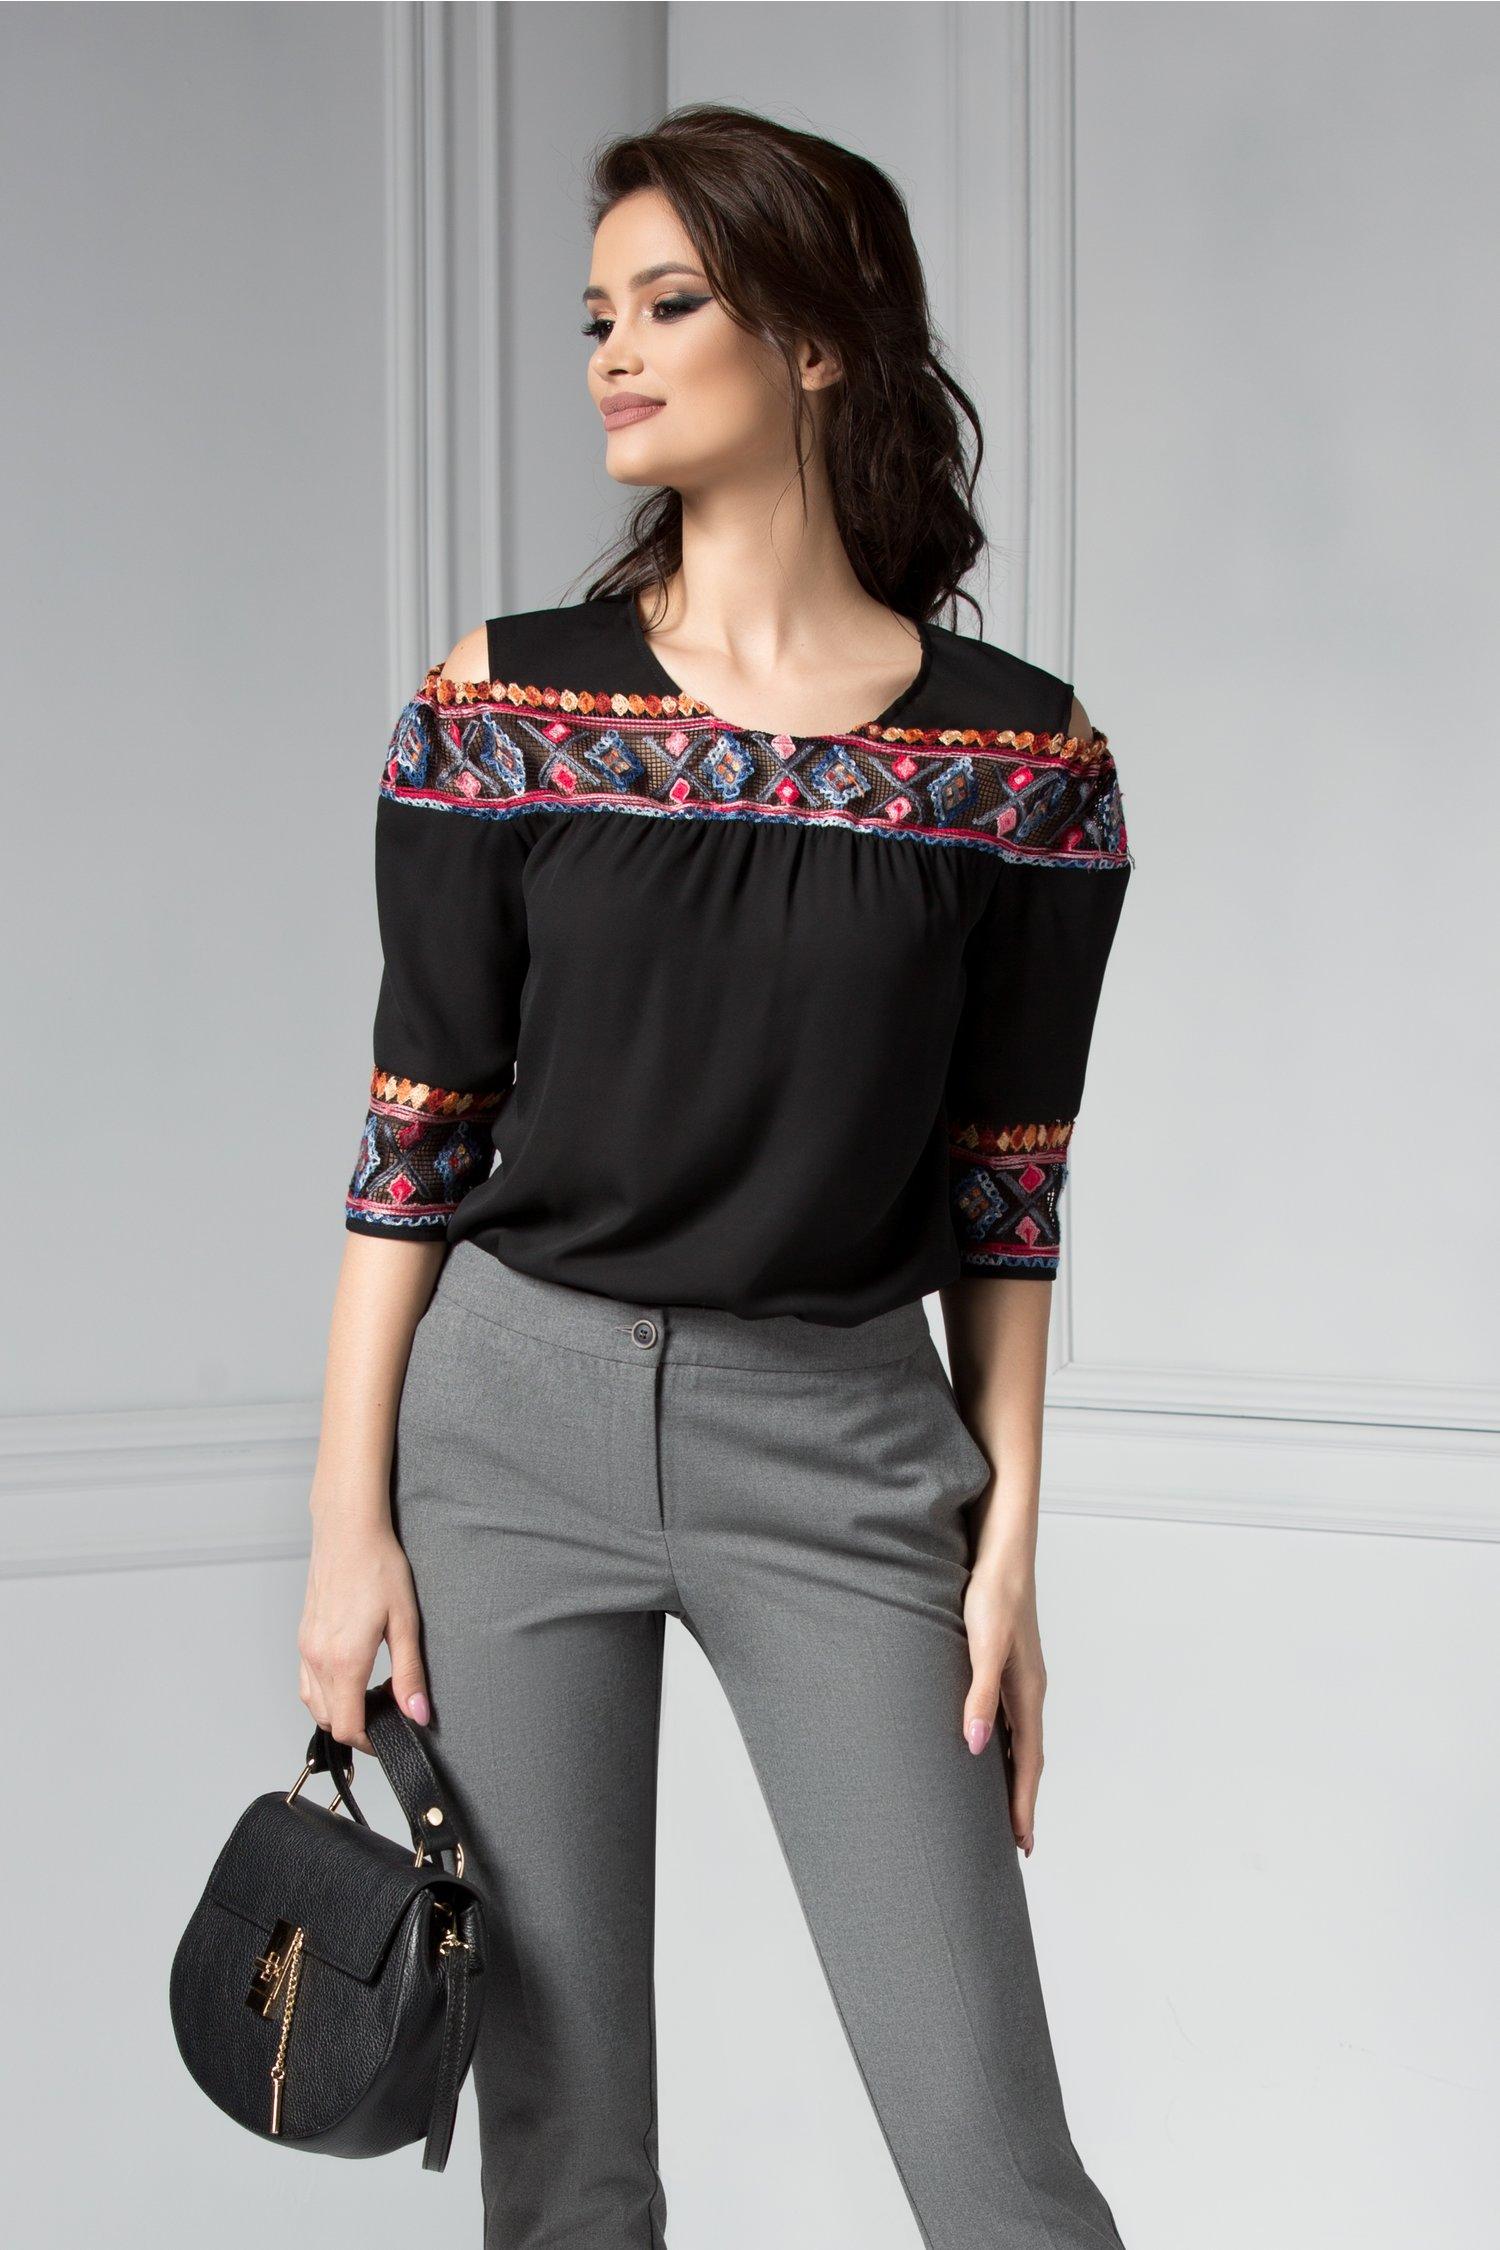 Bluza Moze Anette neagra cu broderie traditionala